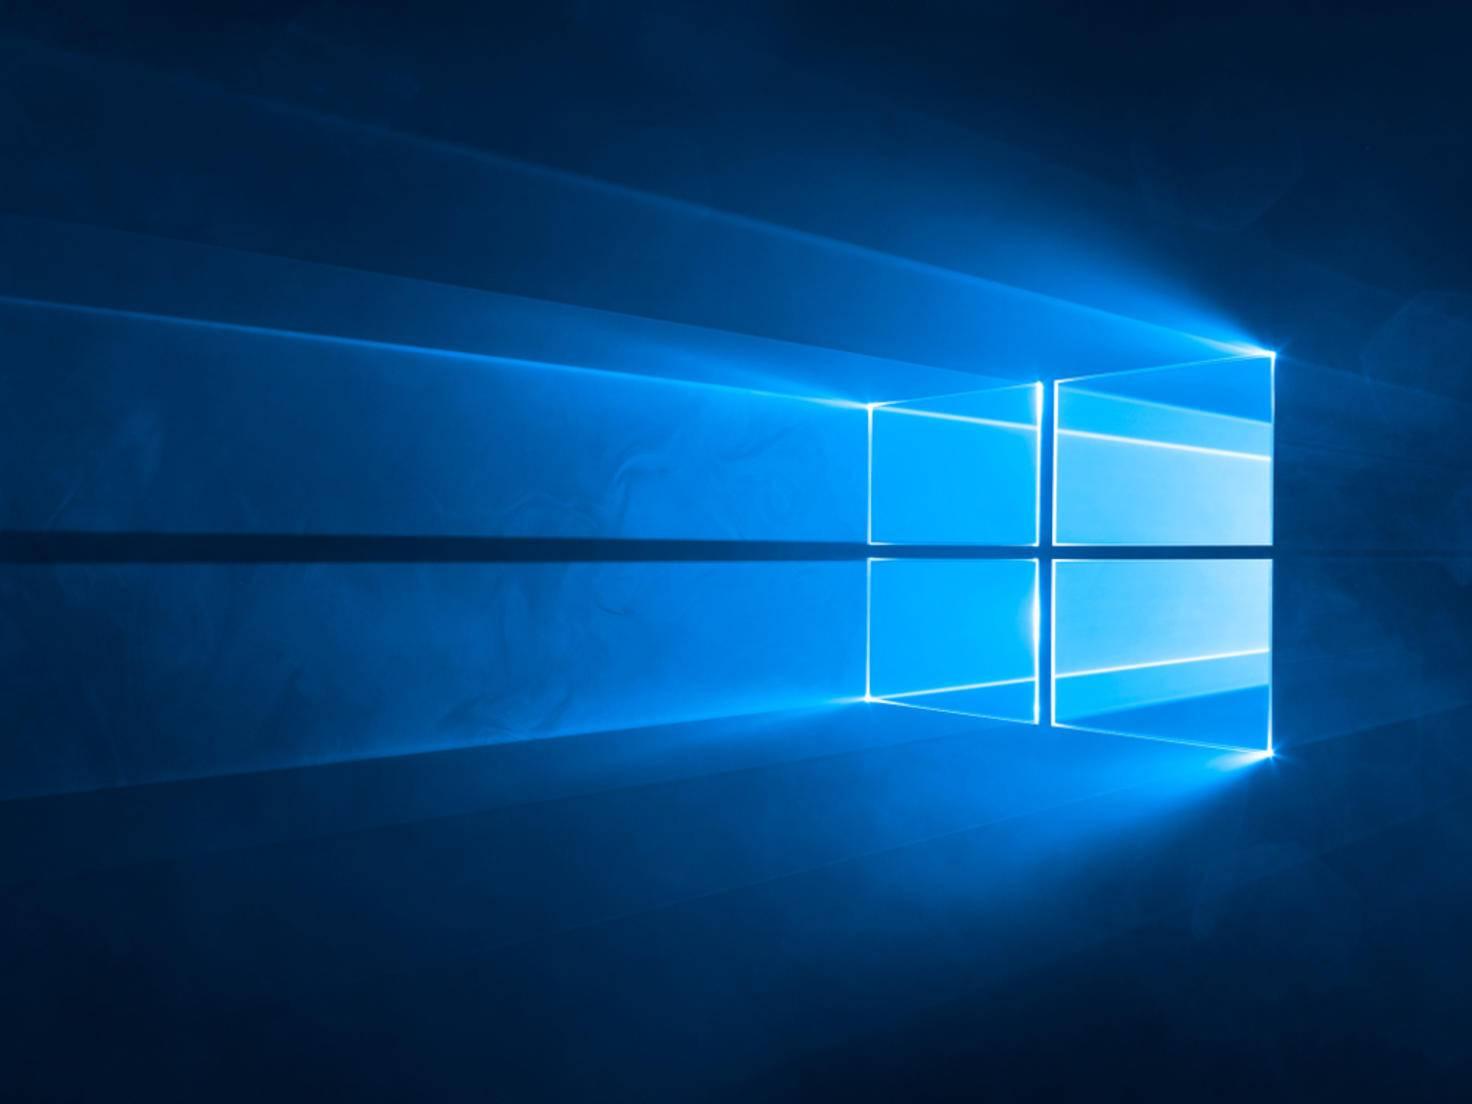 Windows_10_Stock_Wallpaper